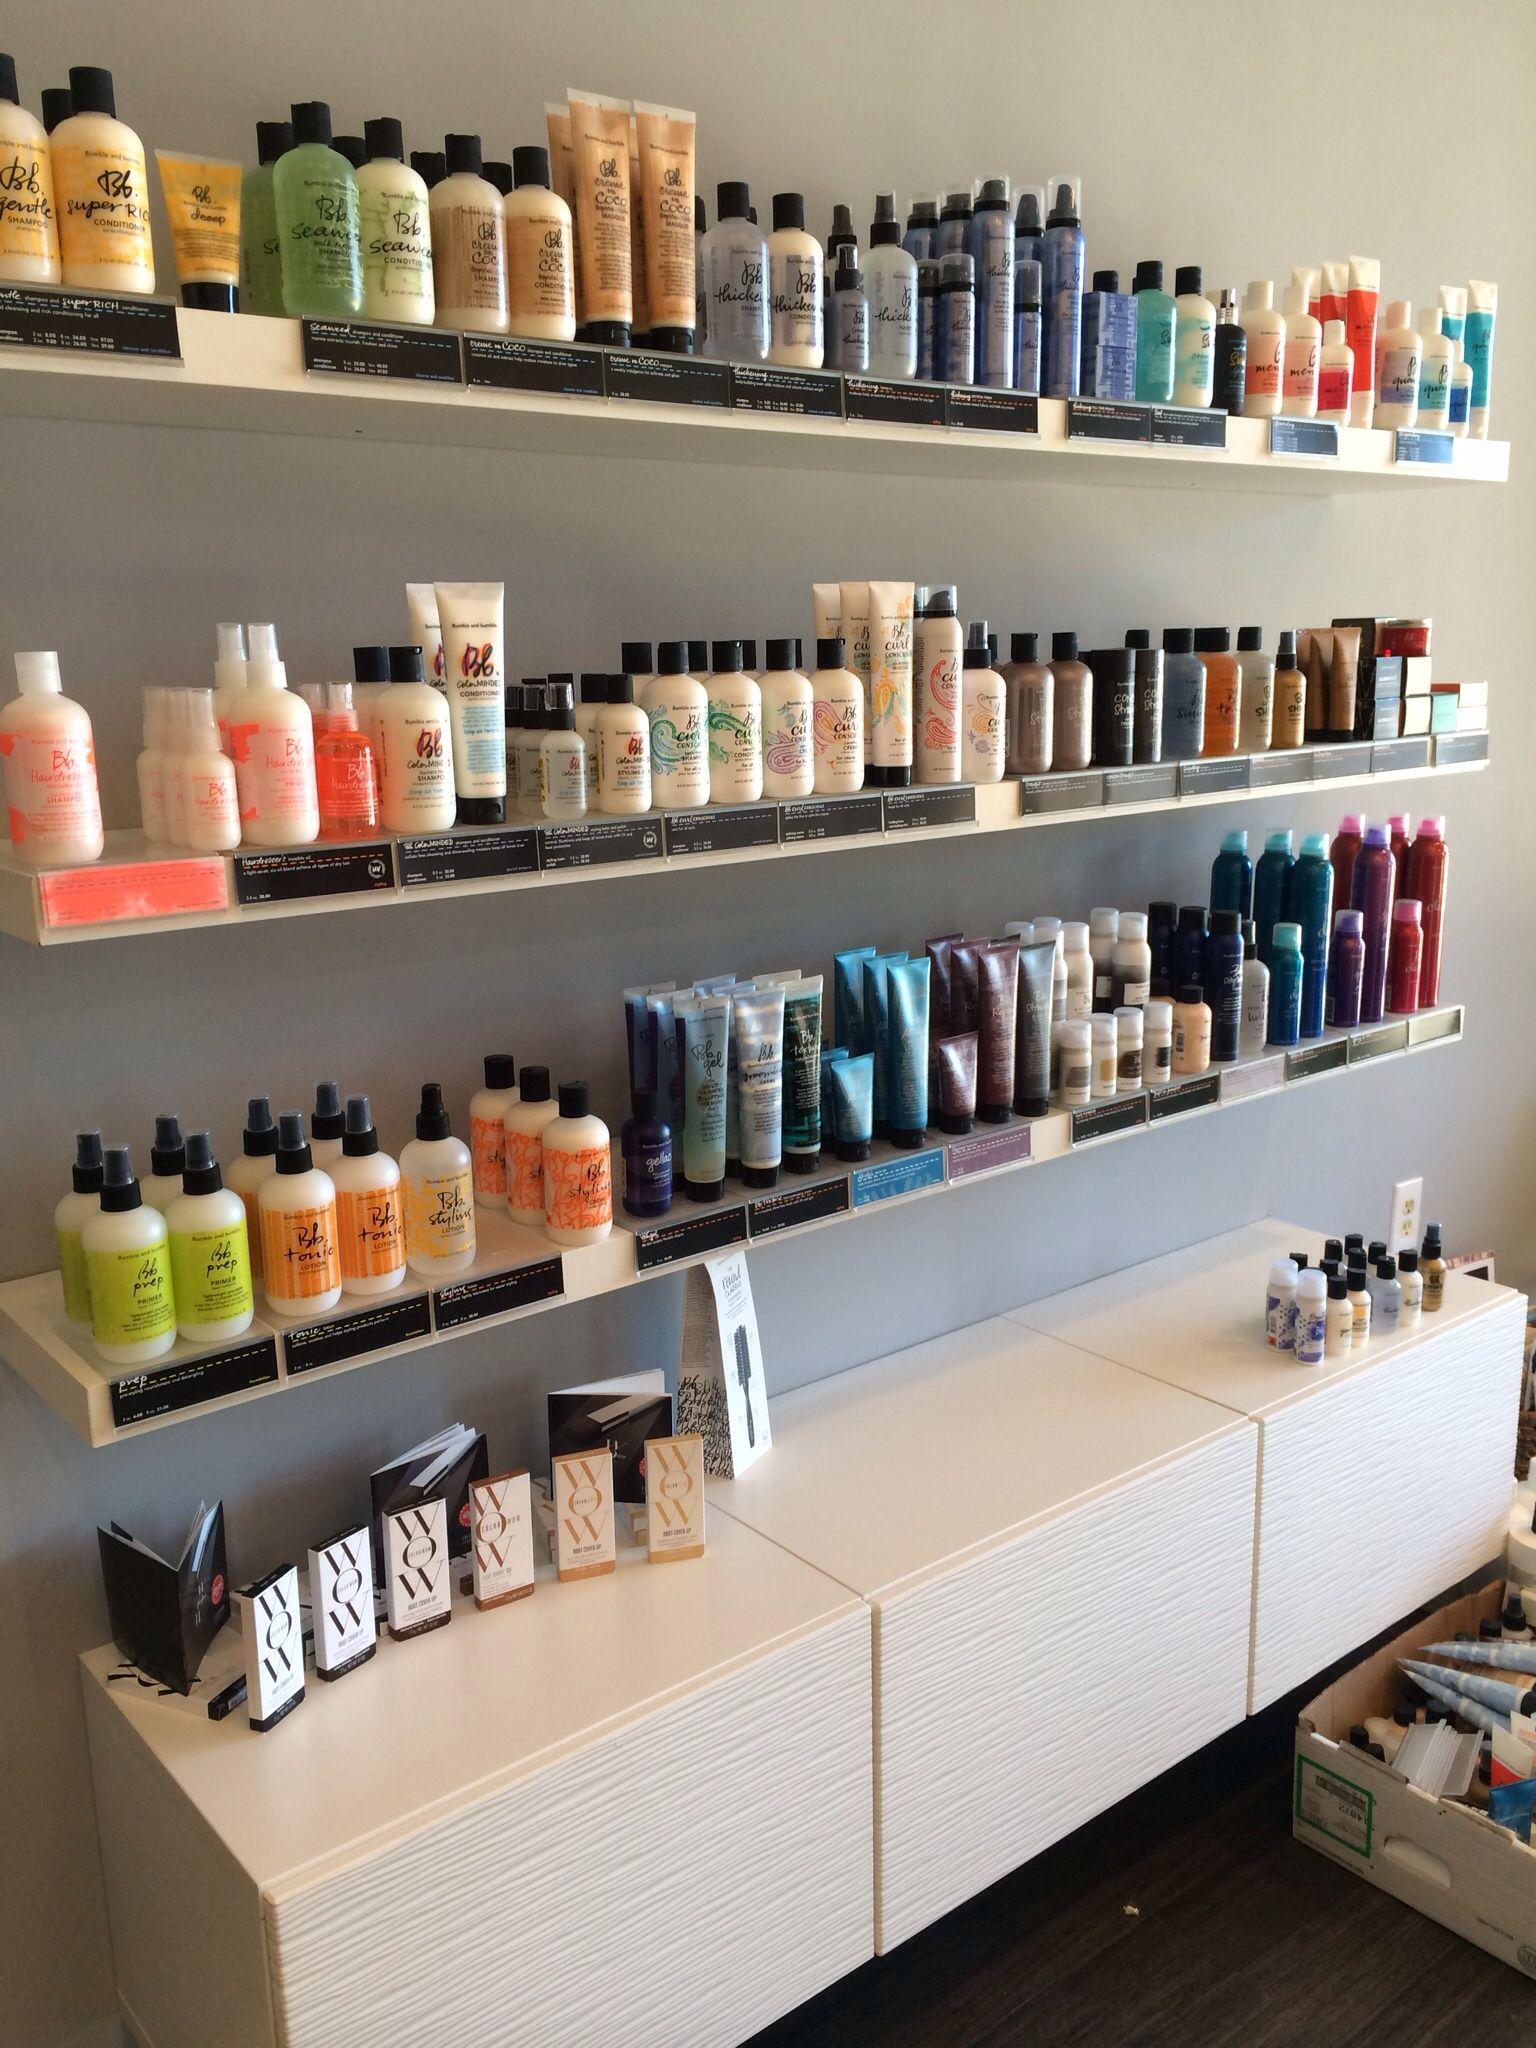 Mirage Hair Studio Ikea Retail shelving Myrtle Beach SC  New Mirage Hair Studio Salon in